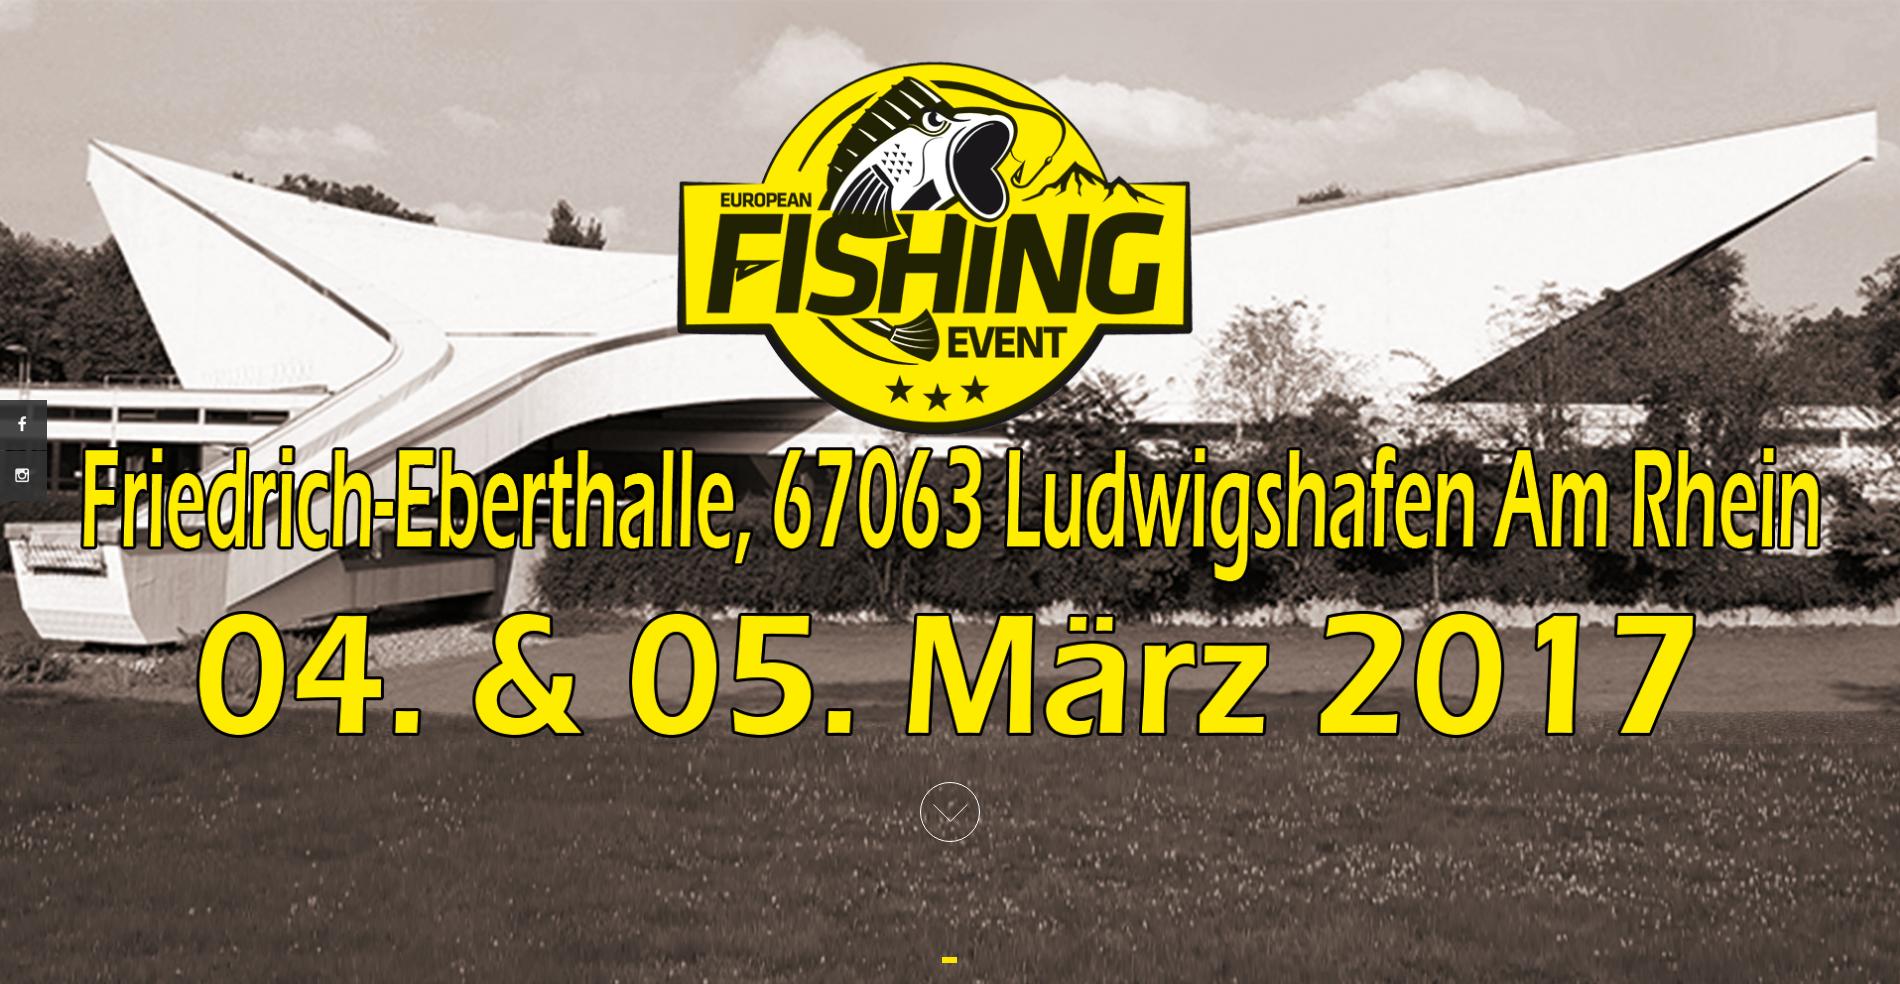 Bildschirmfoto 2017 01 09 um 09.34.17 - Carpmeeting Speyer 2.0 – Das European Fishing Event